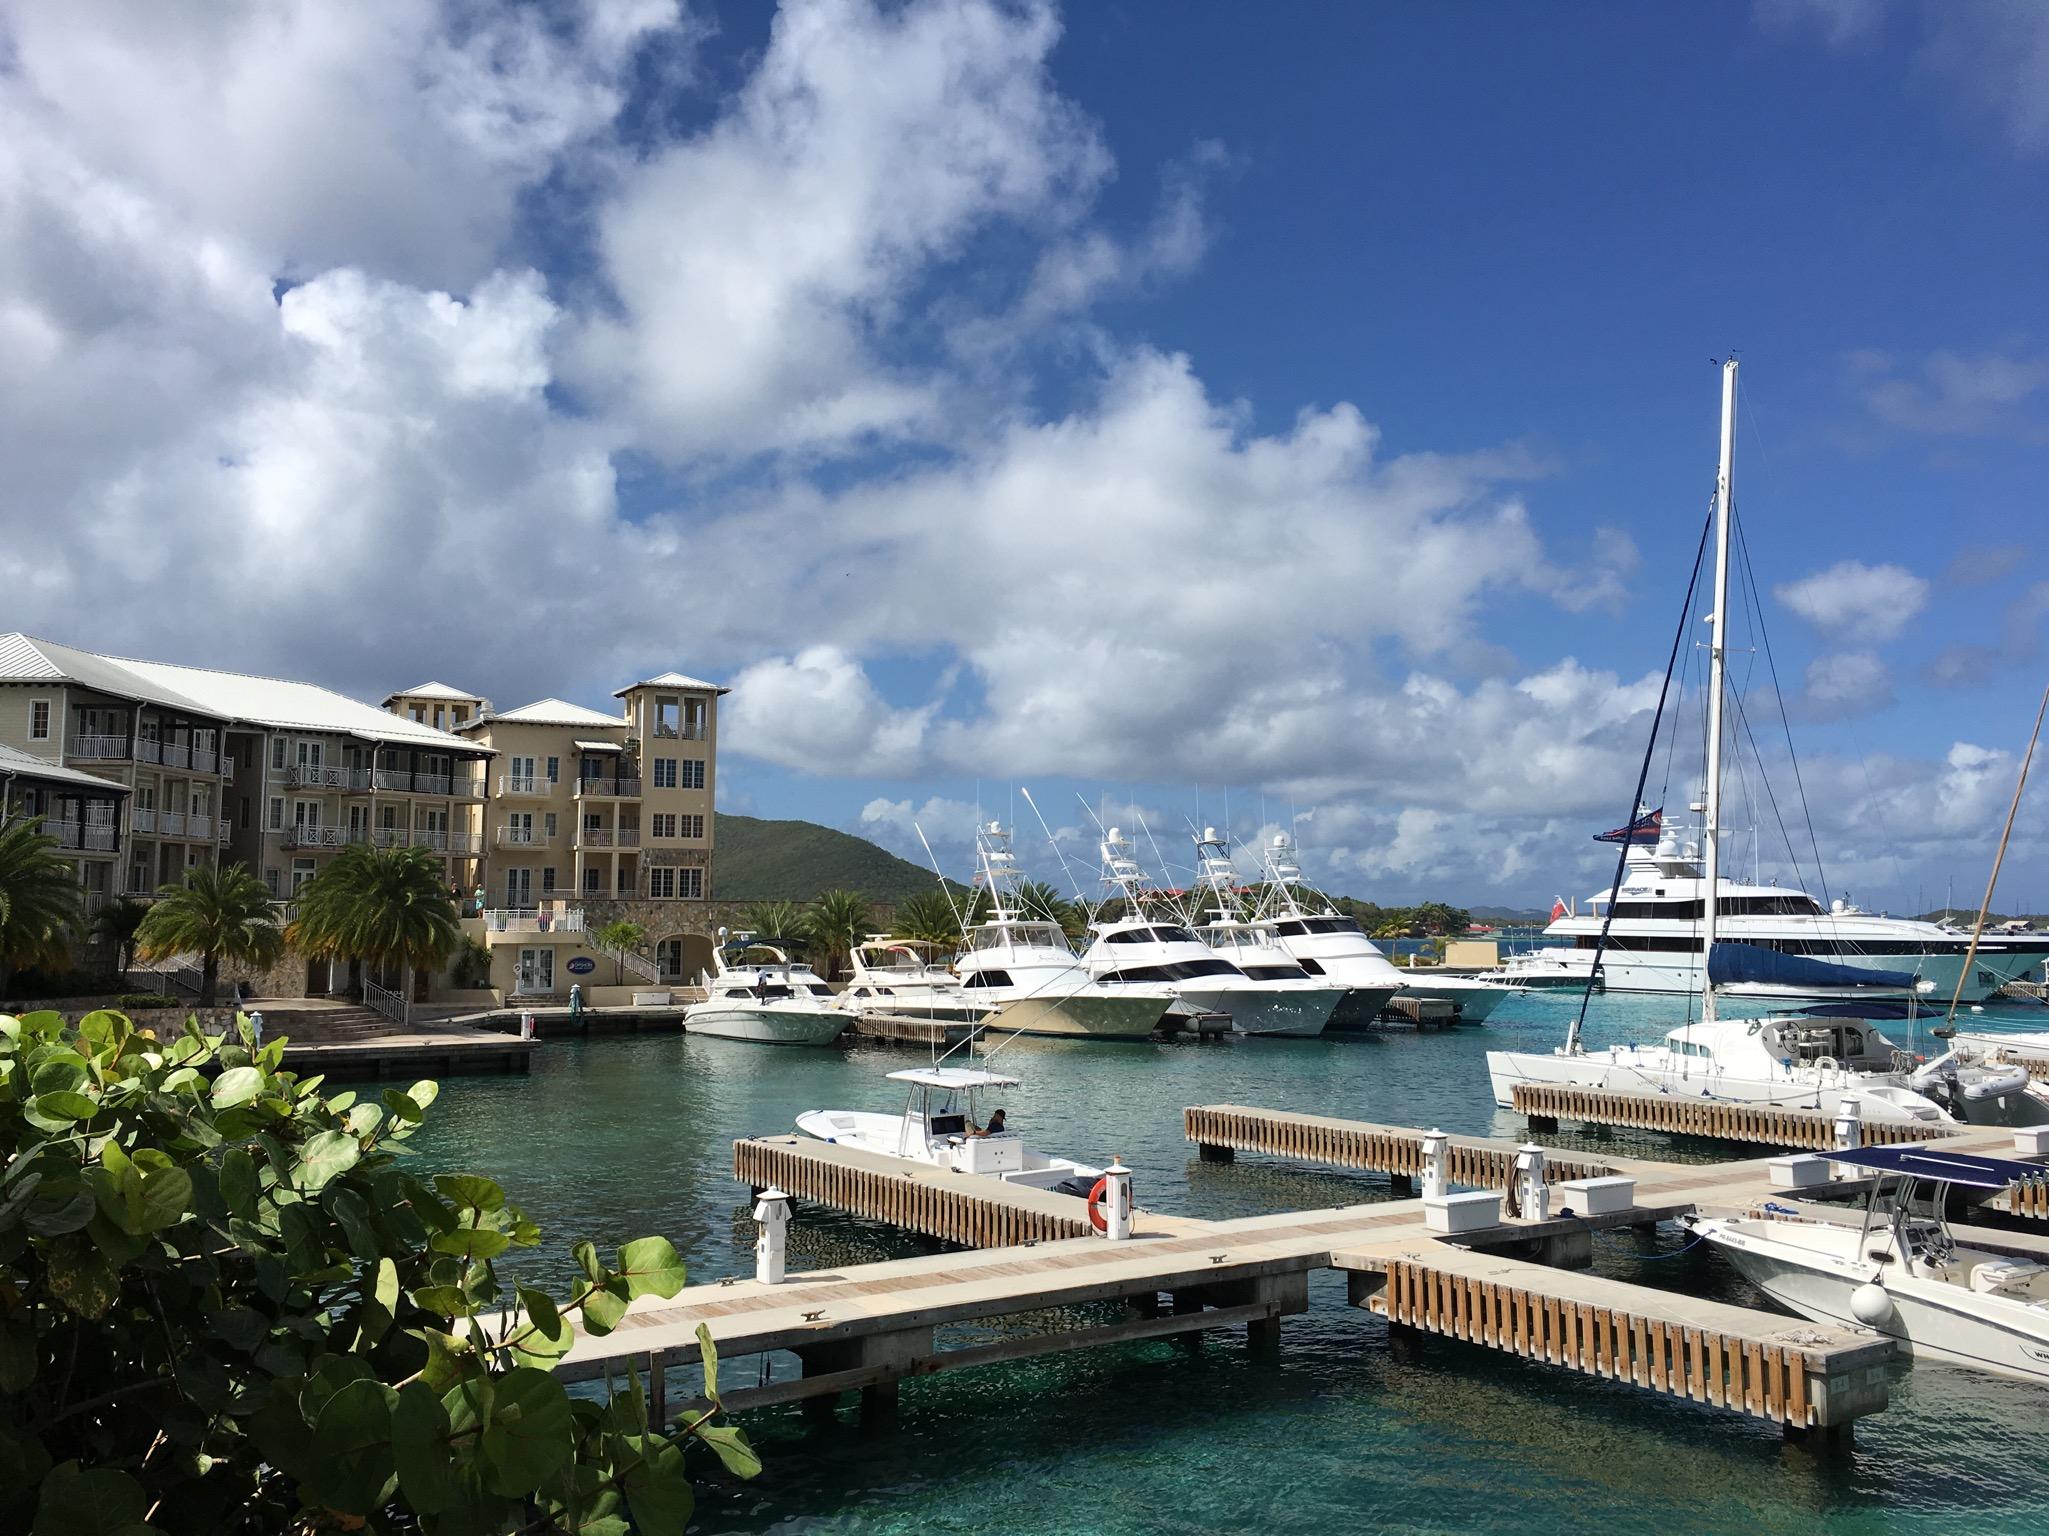 scrub-island-dock-5